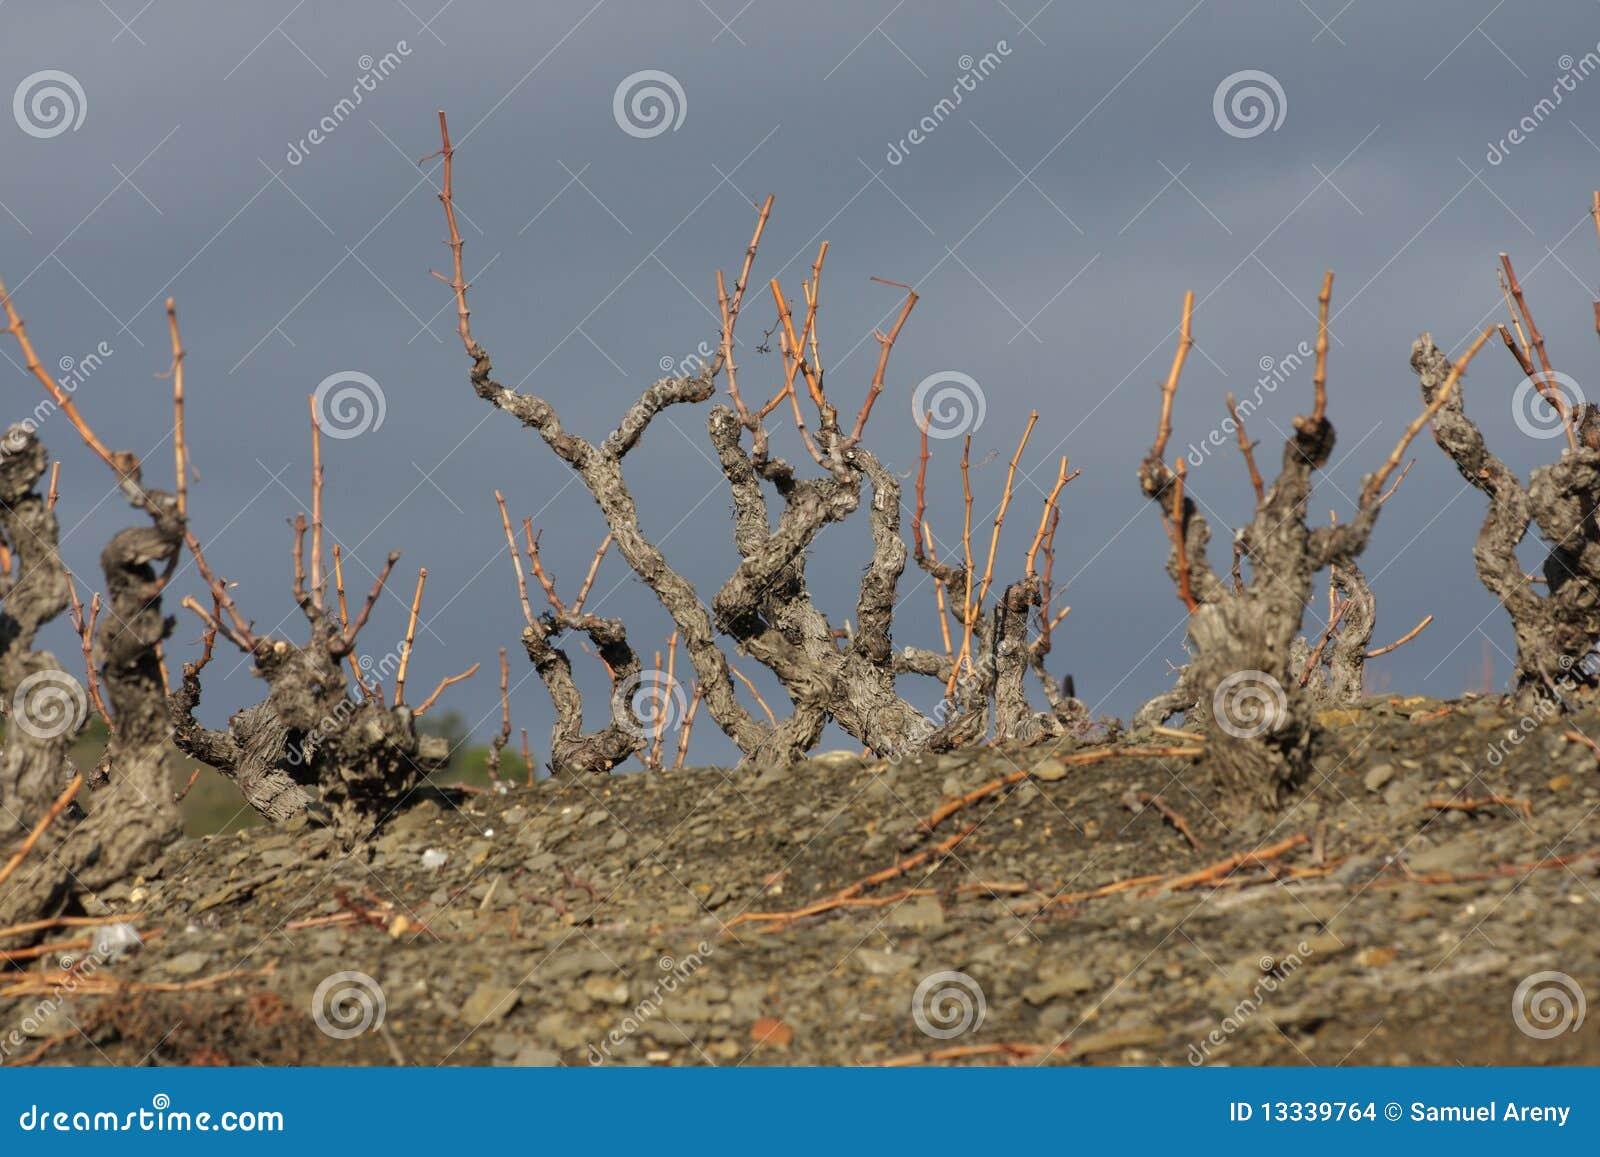 France winograd